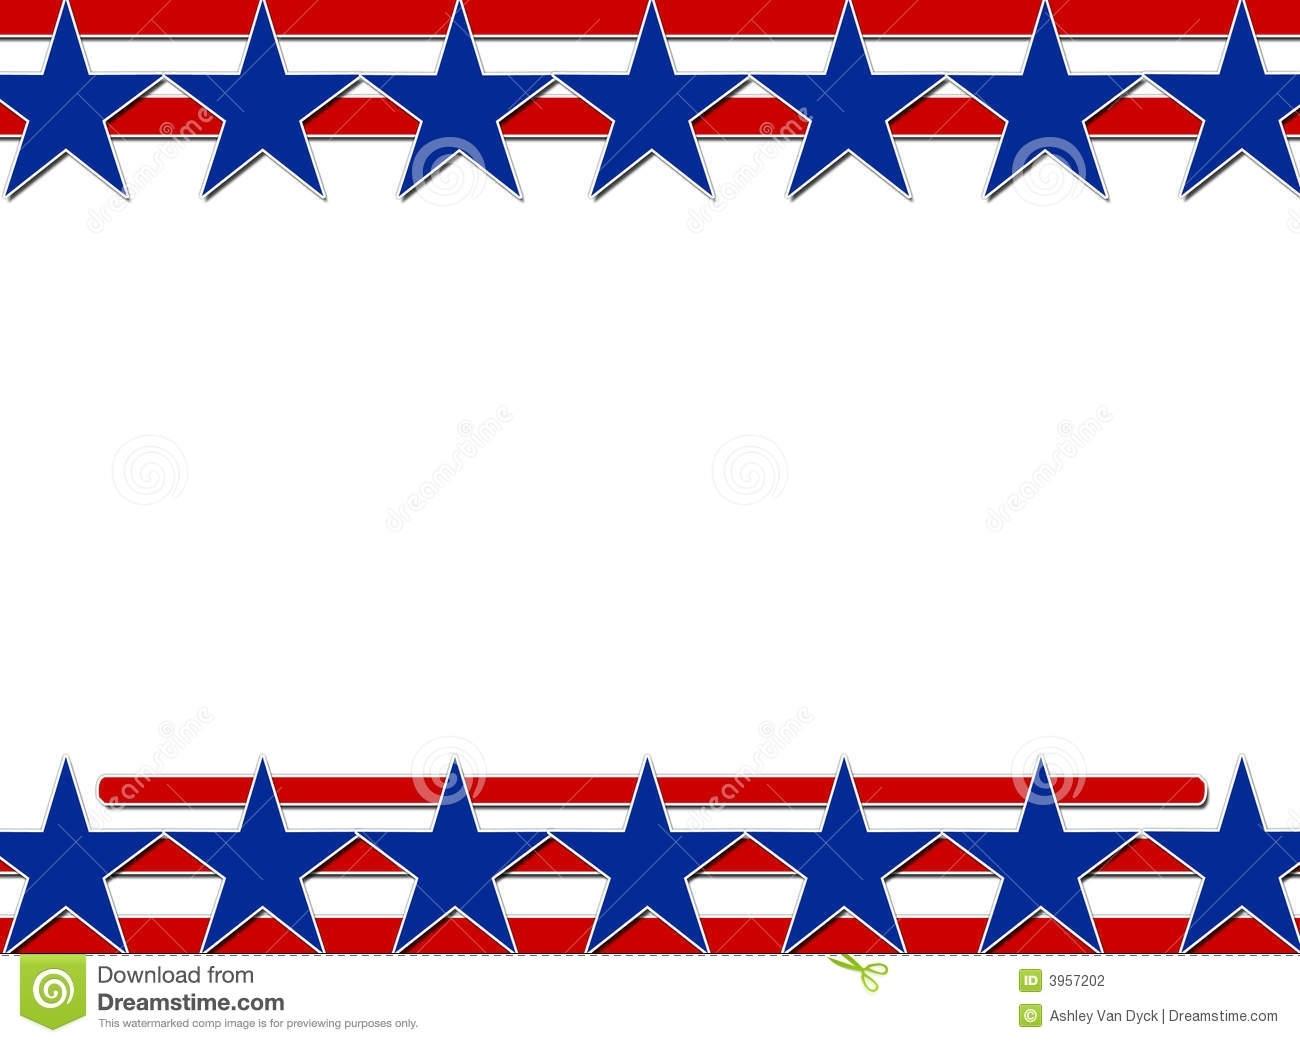 stars and stripes background stock illustration - illustration of